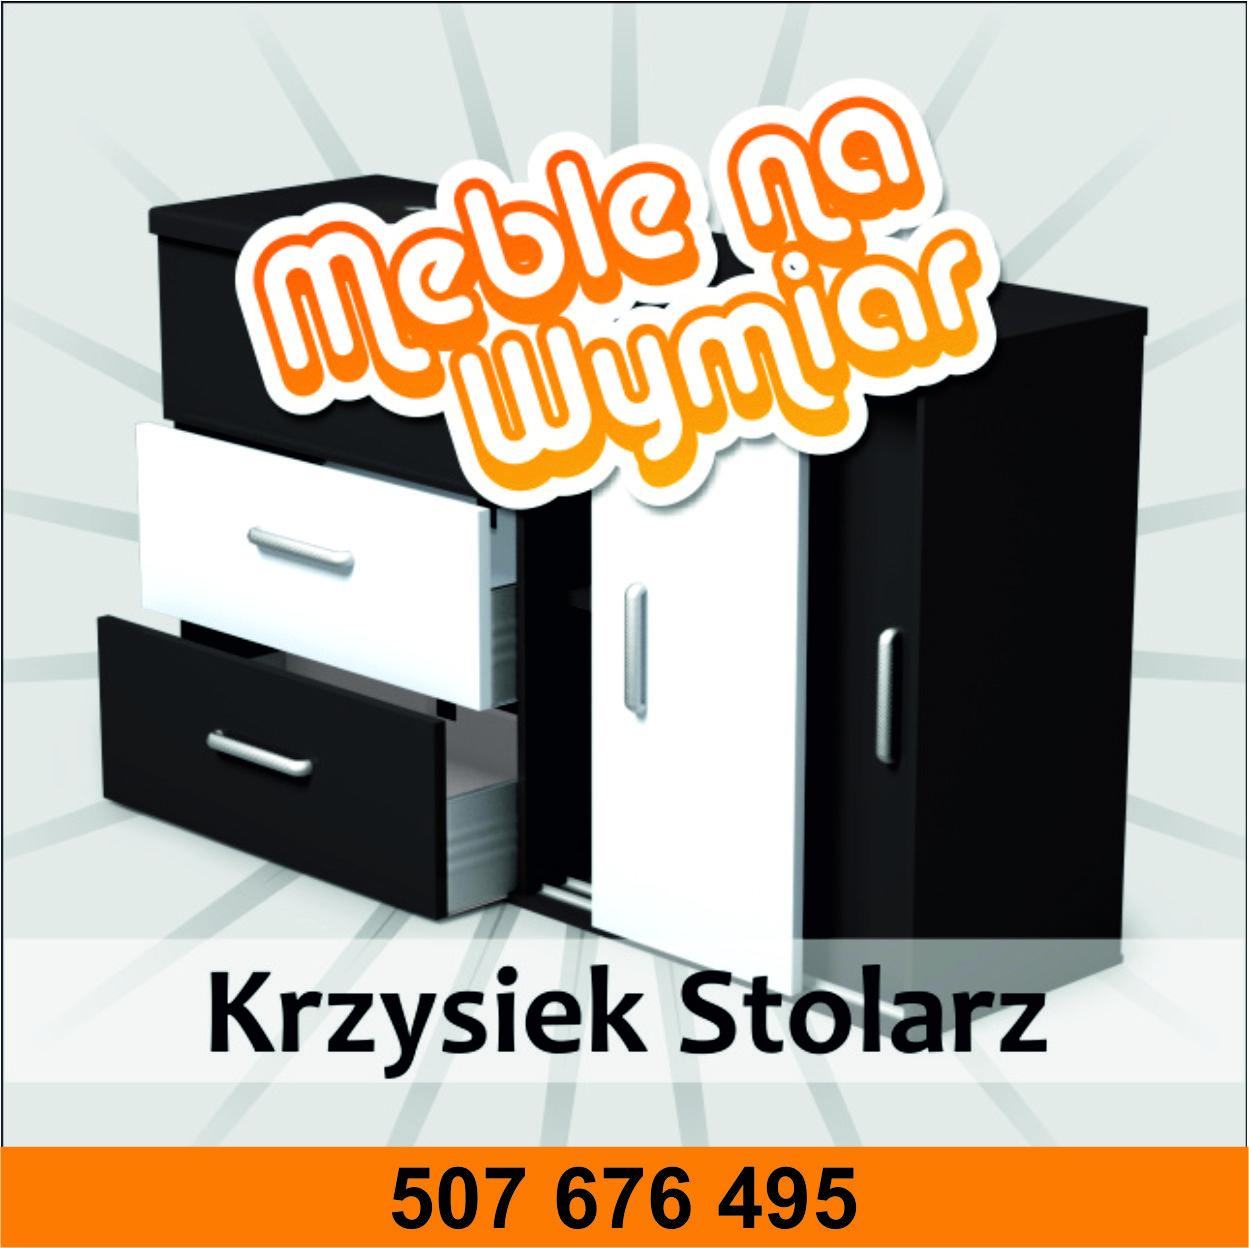 KJK Studio - Stolarz Krzysiek